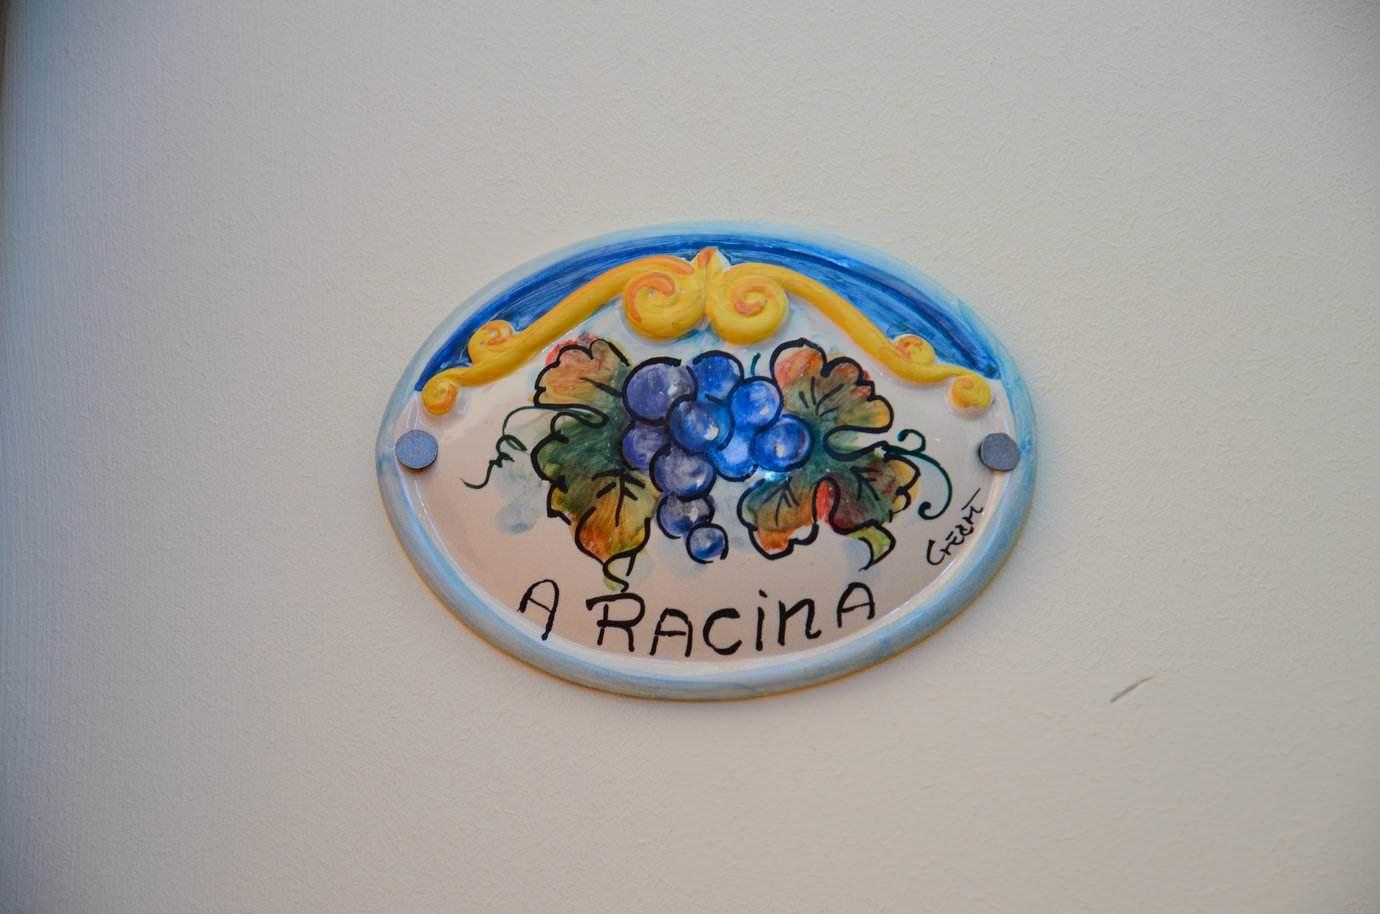 dimora-dell-etna-camere-racina-5